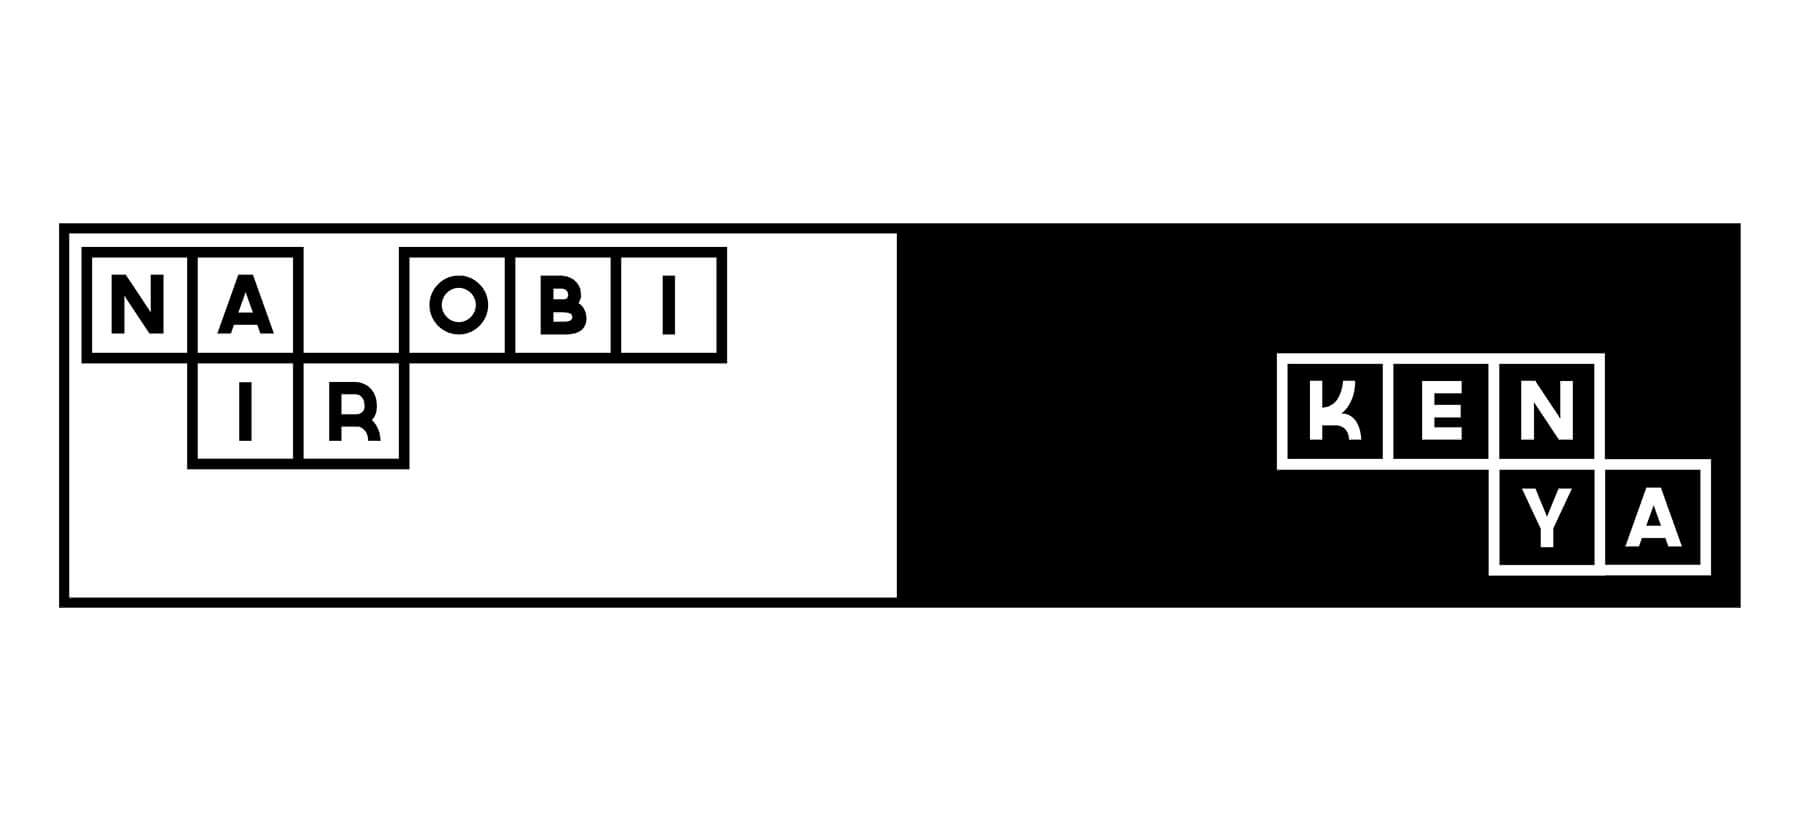 riette-error-dentsu-aegis-network-office-signage-branding-signs-nairobi-kenya-06